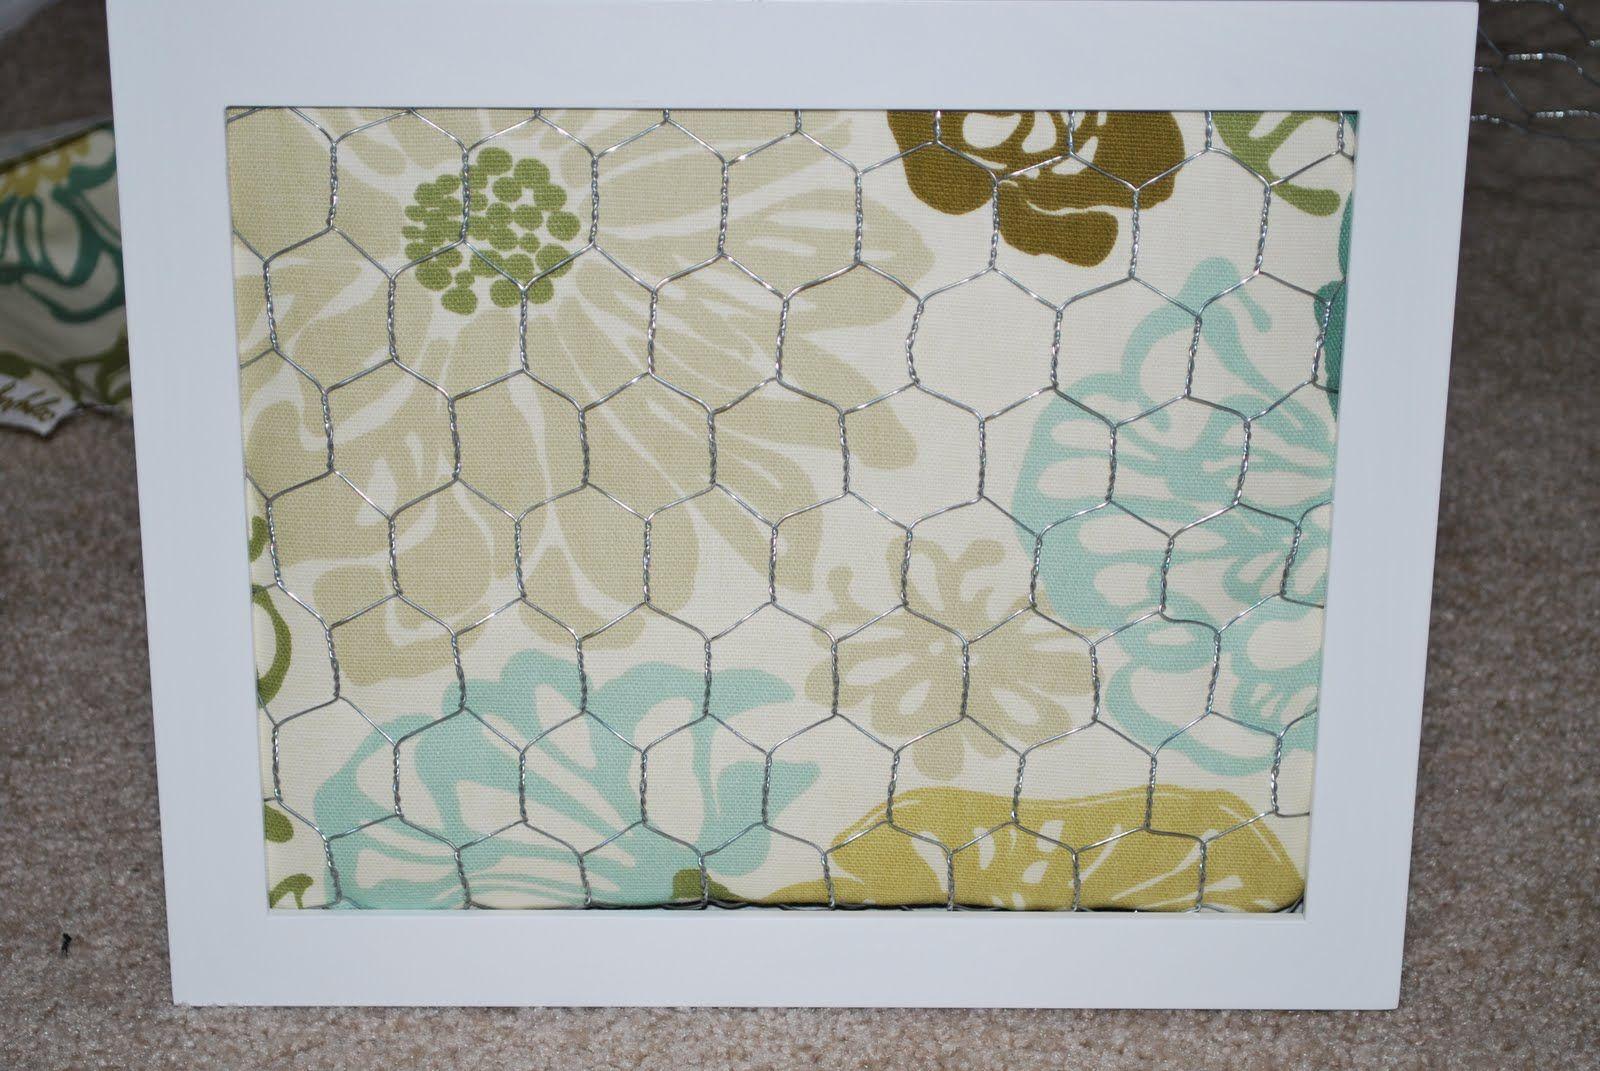 Framed Fabric Board Jewelry Organizer (she: Nichole | Chicken wire ...